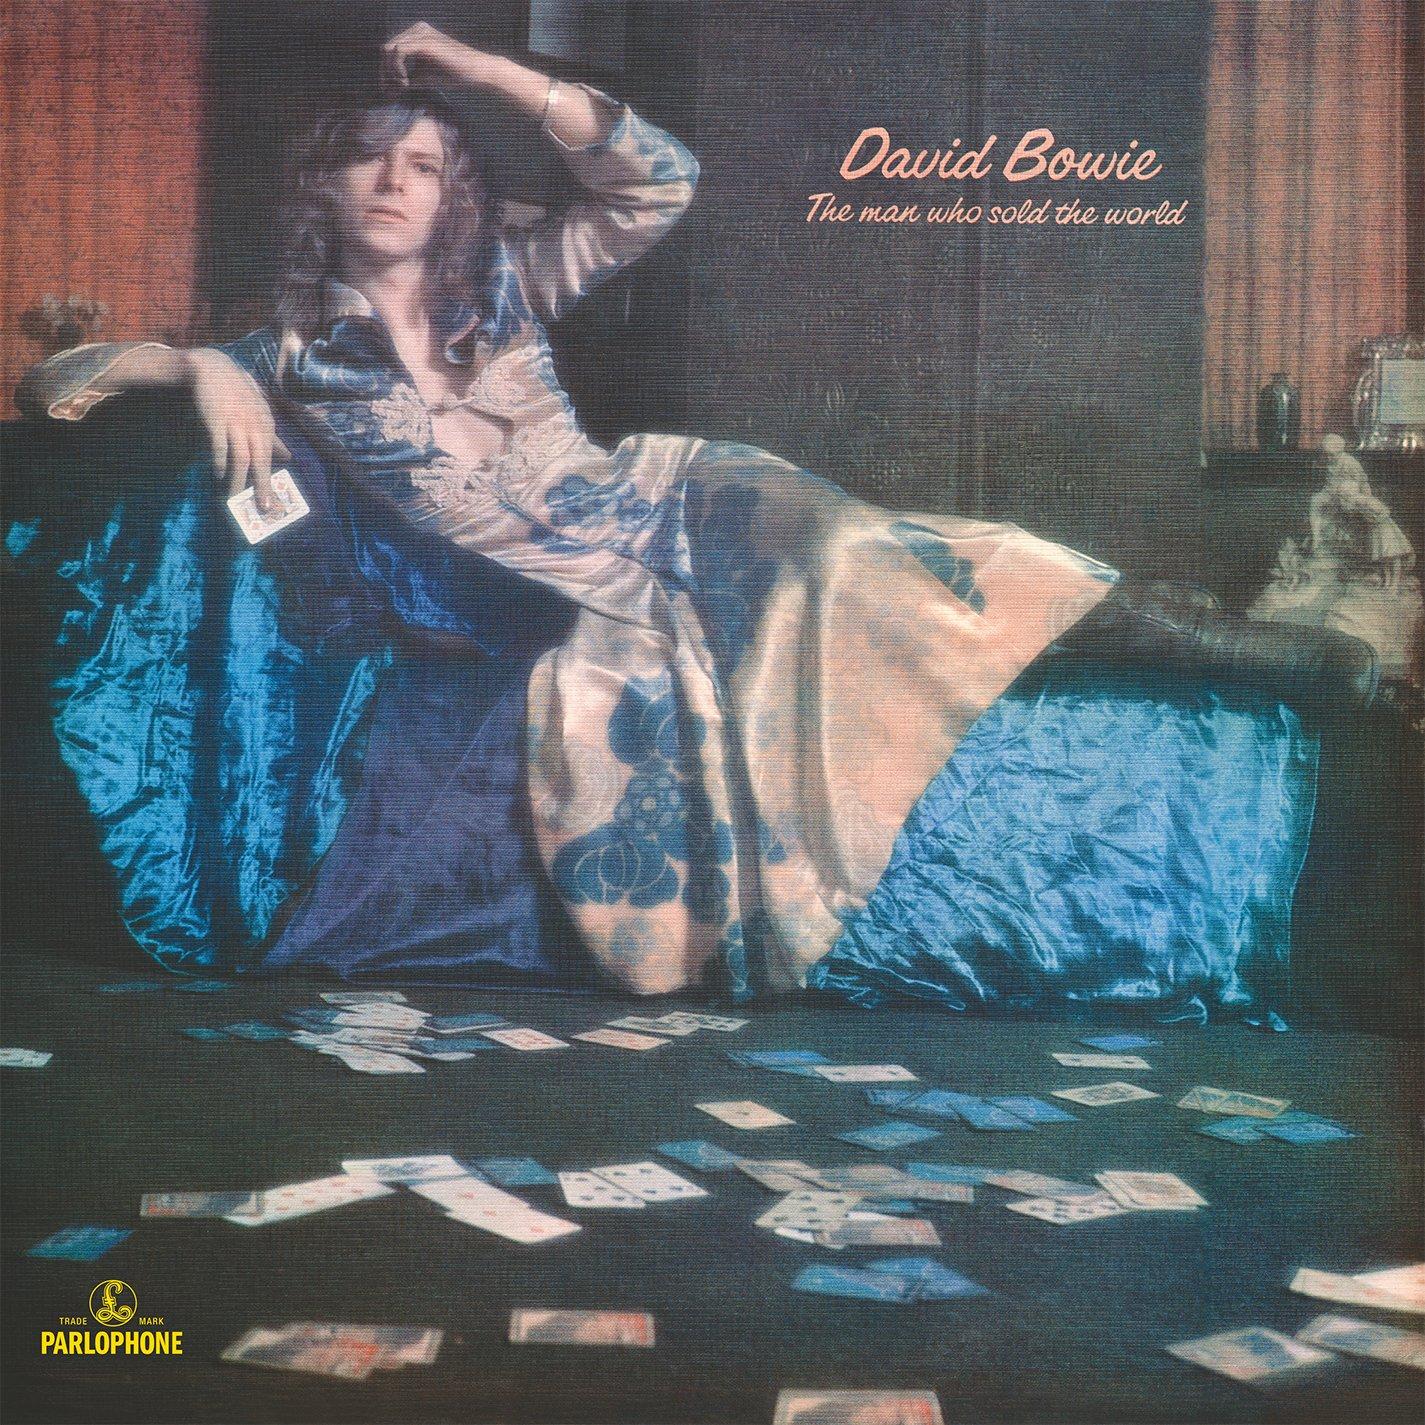 Vinilo : David Bowie - The Man Who Sold the World (180 Gram Vinyl)